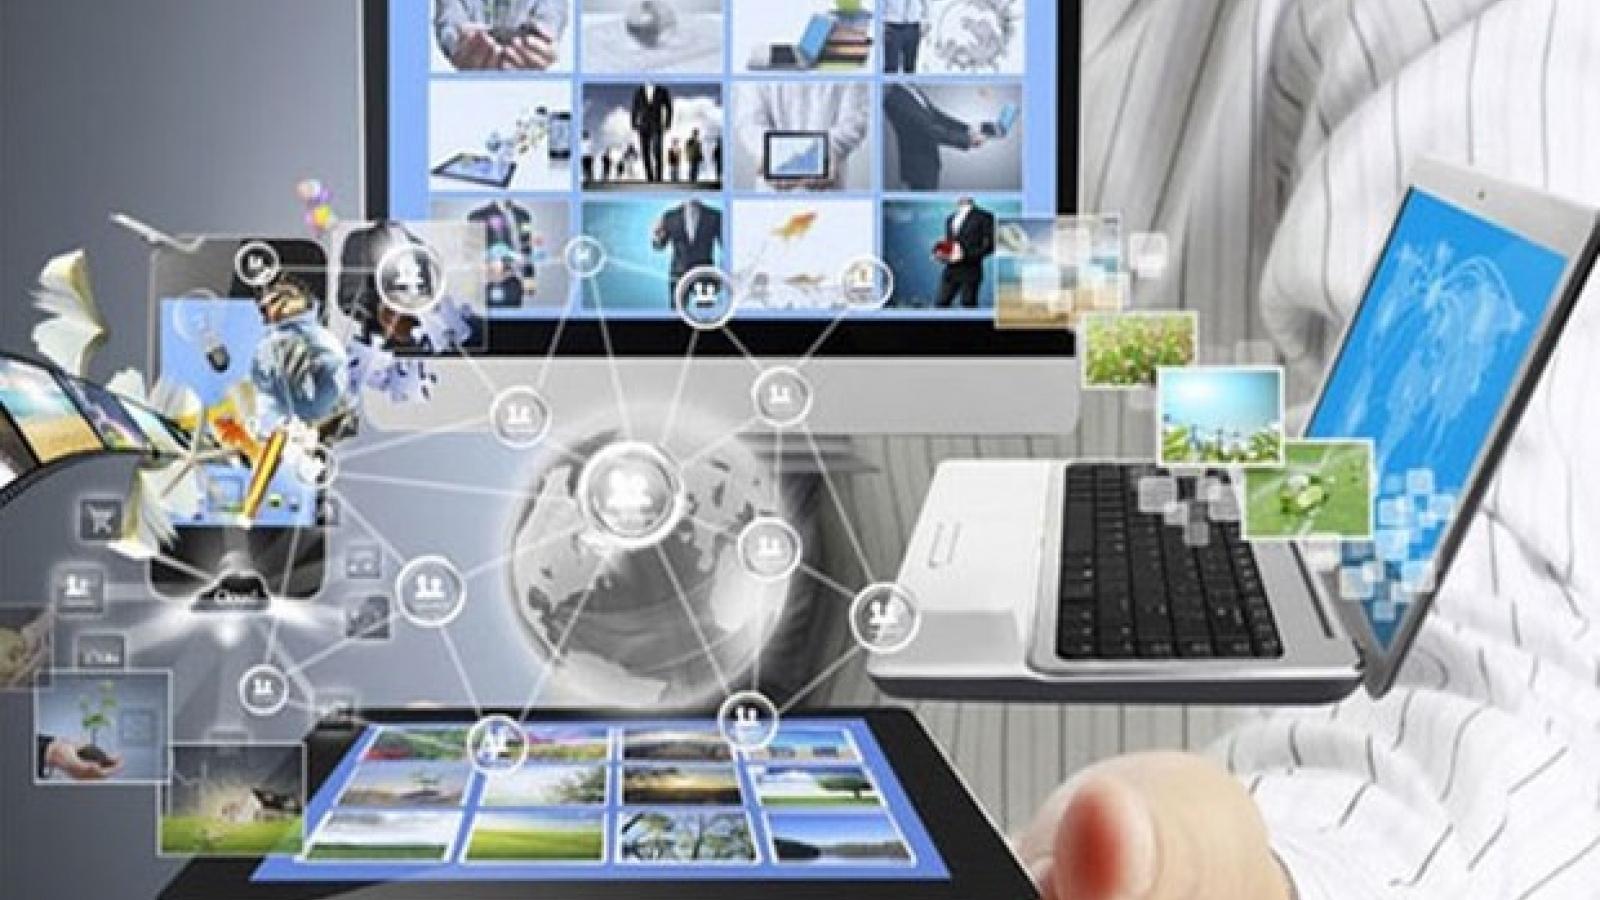 Vietnamese ICT businesses benefit from digital consumption